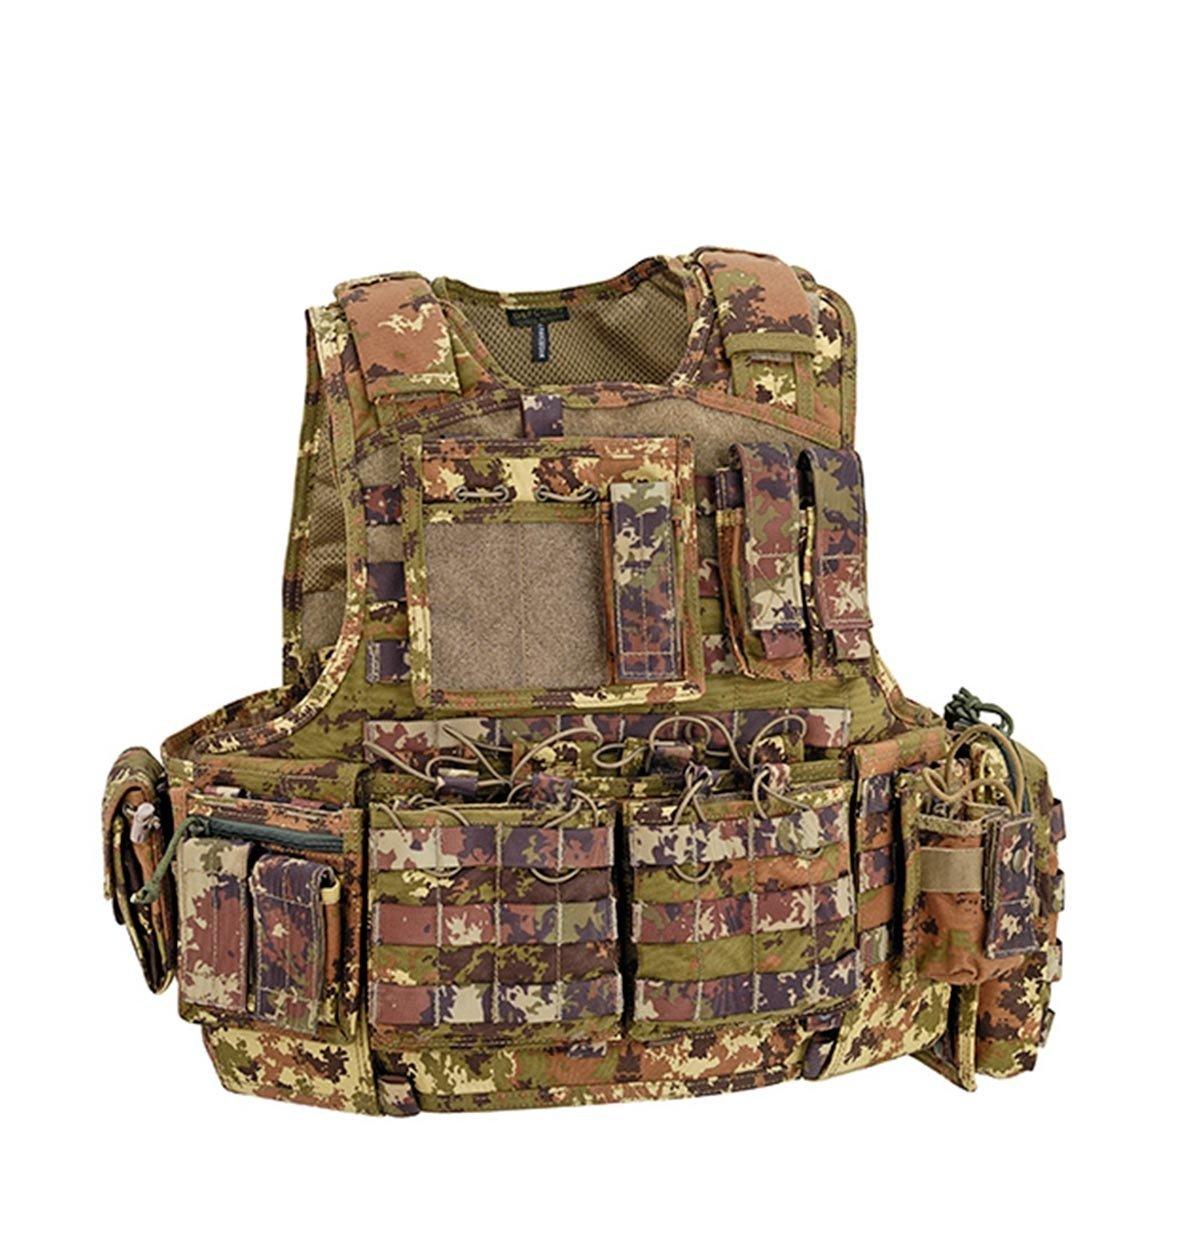 90db8684b09 Body Armor Carrier Set, Vegetato Italiano   Military Tactical   Military  Equipment   Tactical Vests Shooting Gear   Shooting Vests militarysurplus.ro